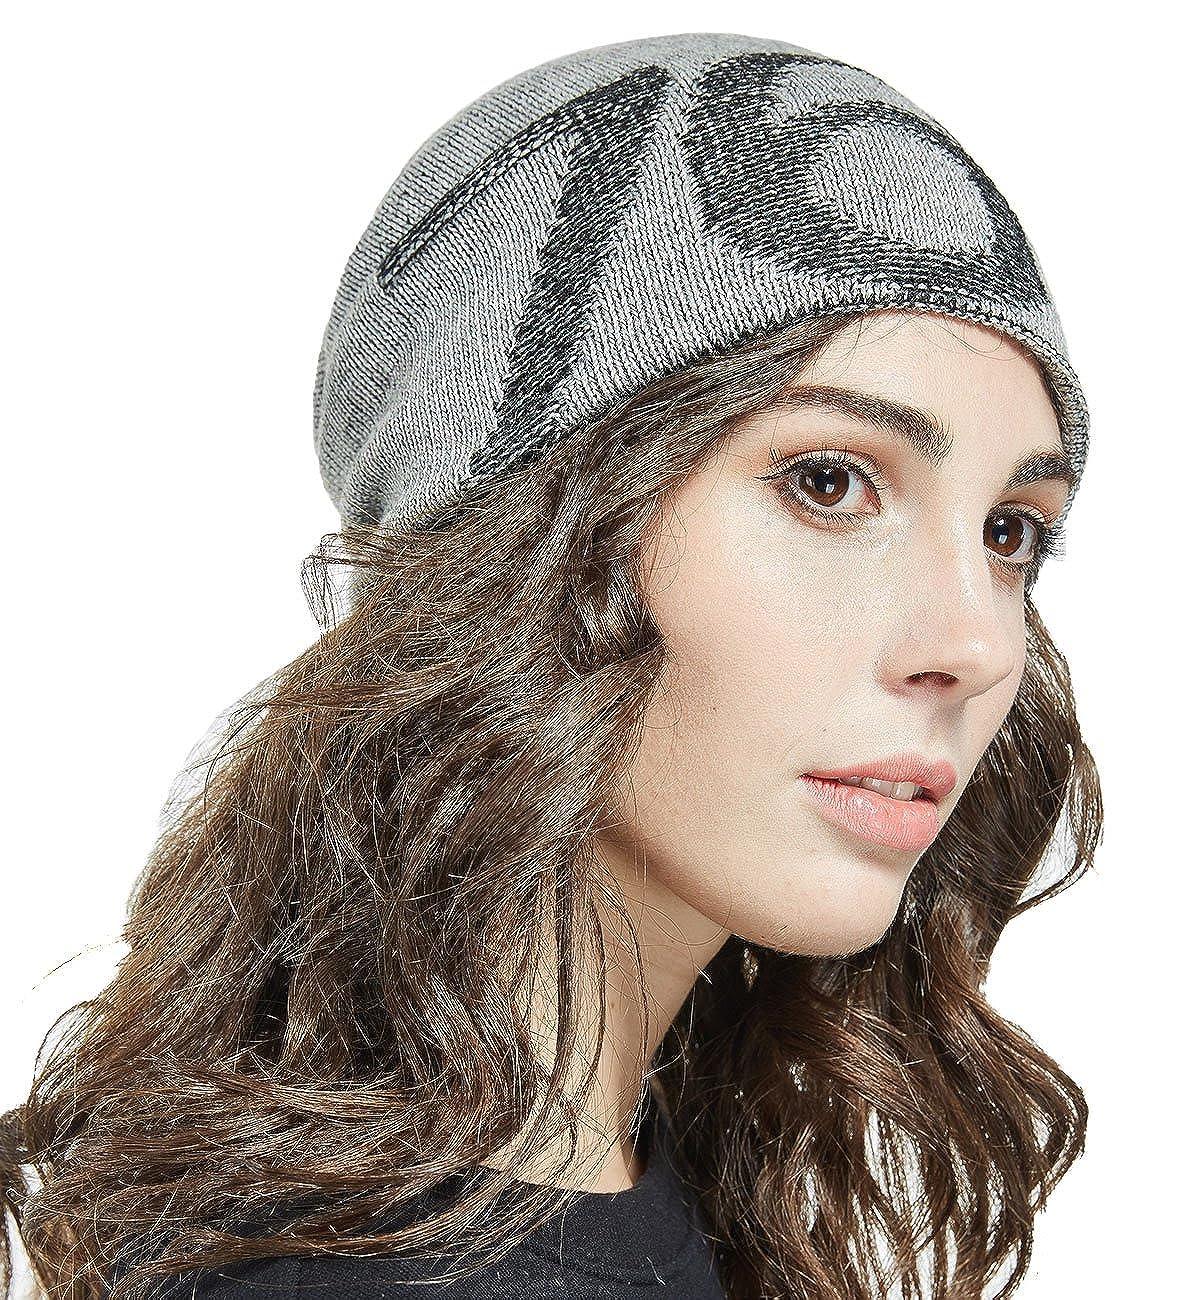 LETHMIK Slouchy Star Long Beanie Warm Winter Ski Skull Cap Knit Hat for Men /& Women